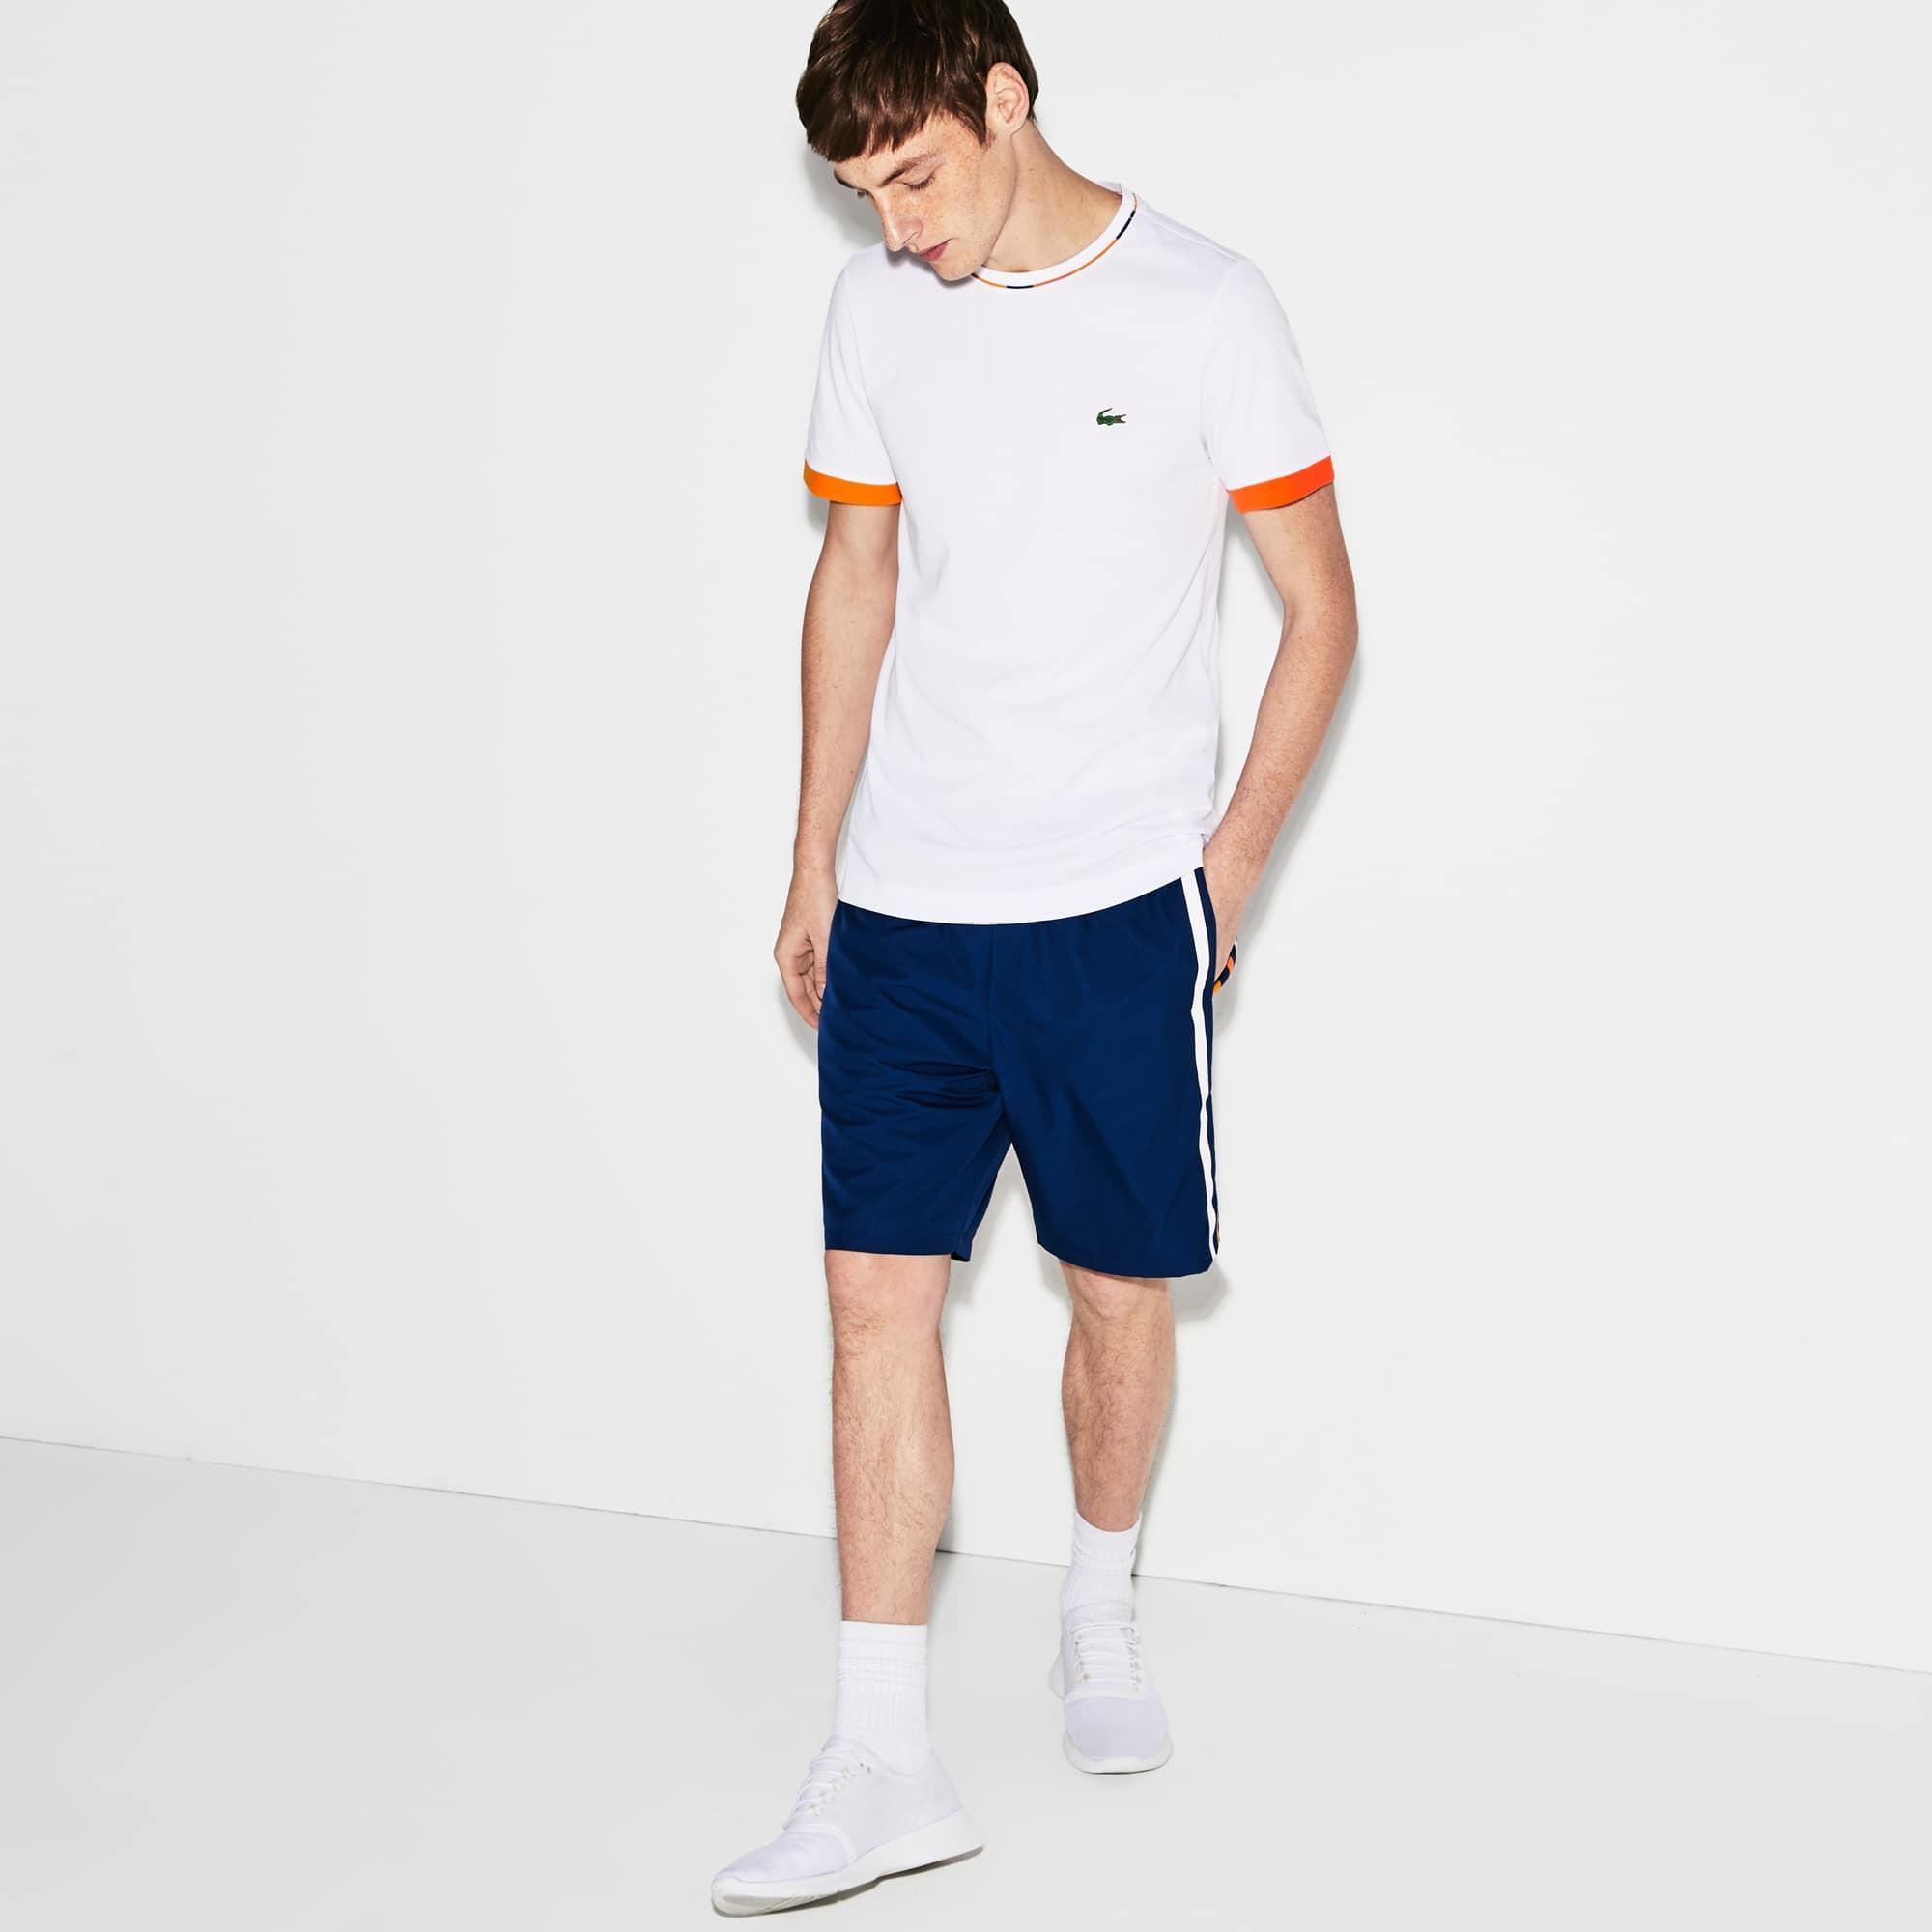 d66d18f8afab Men s Lacoste SPORT Colored Bands Taffeta Tennis Shorts. 410.00 SAR 410.00  SAR. Colour   MARINO WHITE-BUTTERCUP-AP